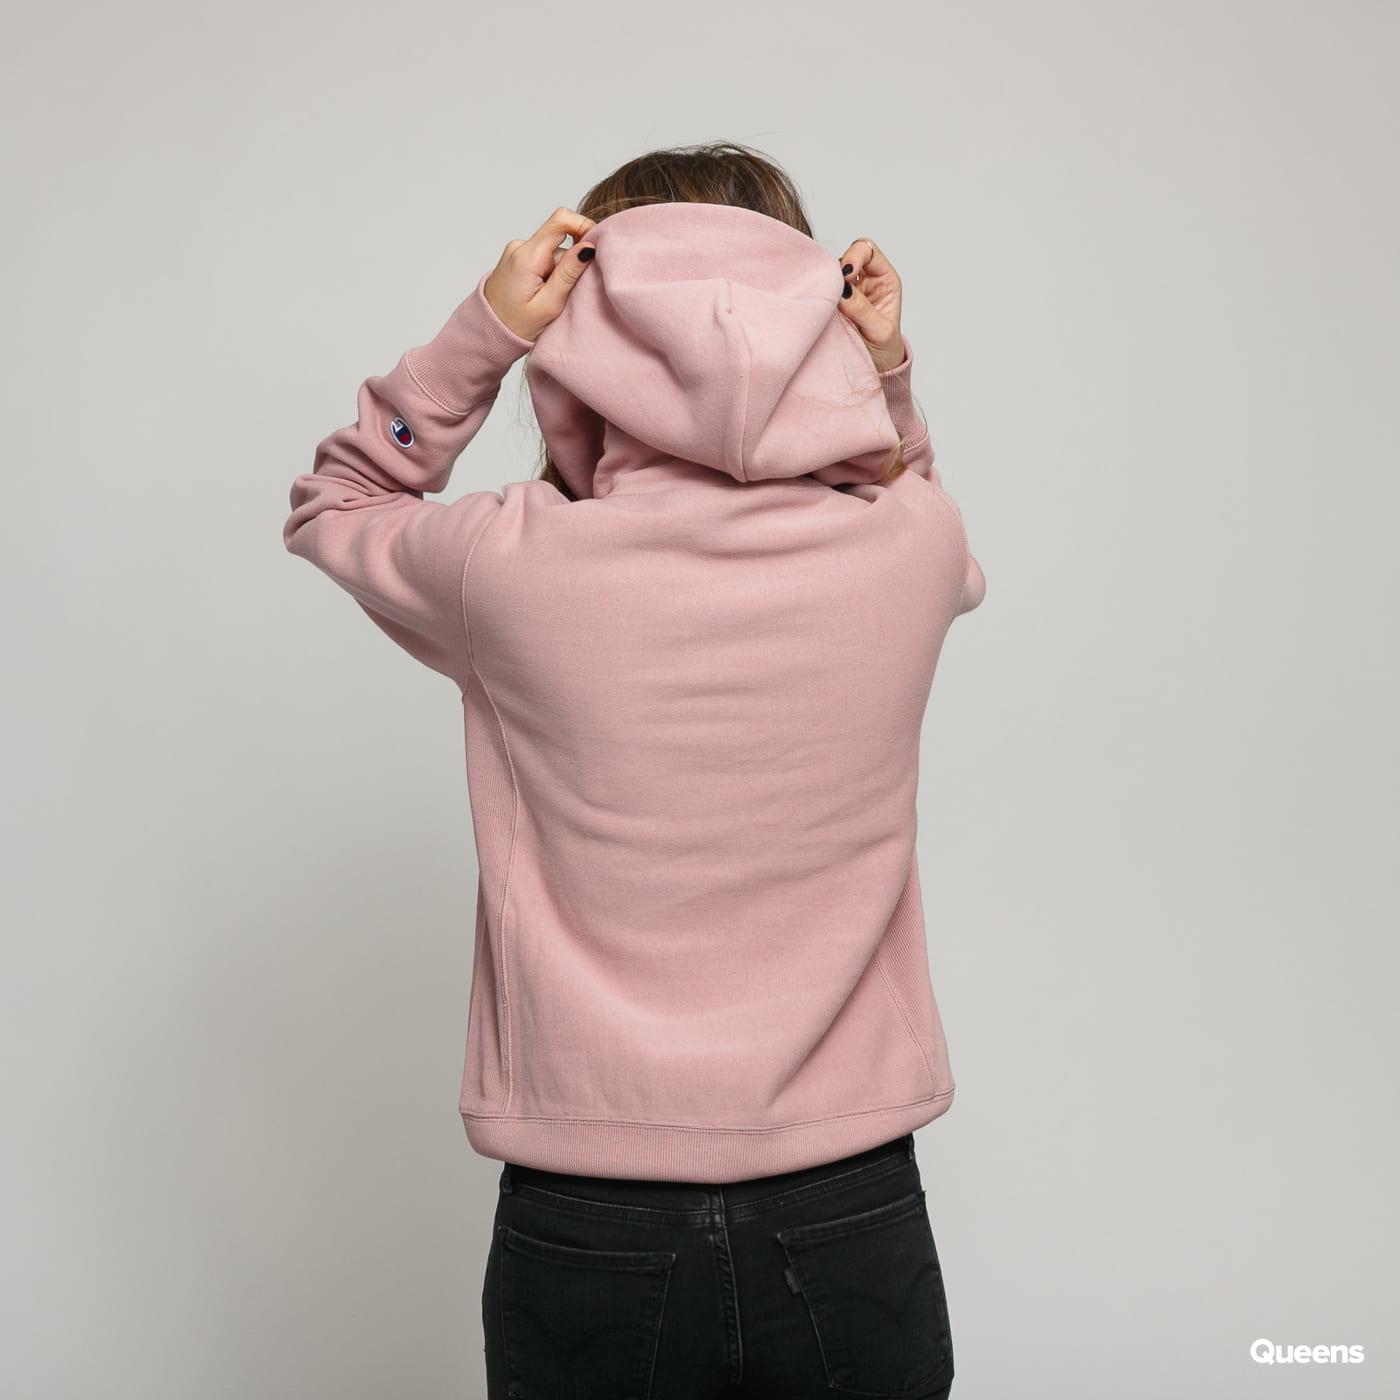 Champion Hooded Sweatshirt light pink